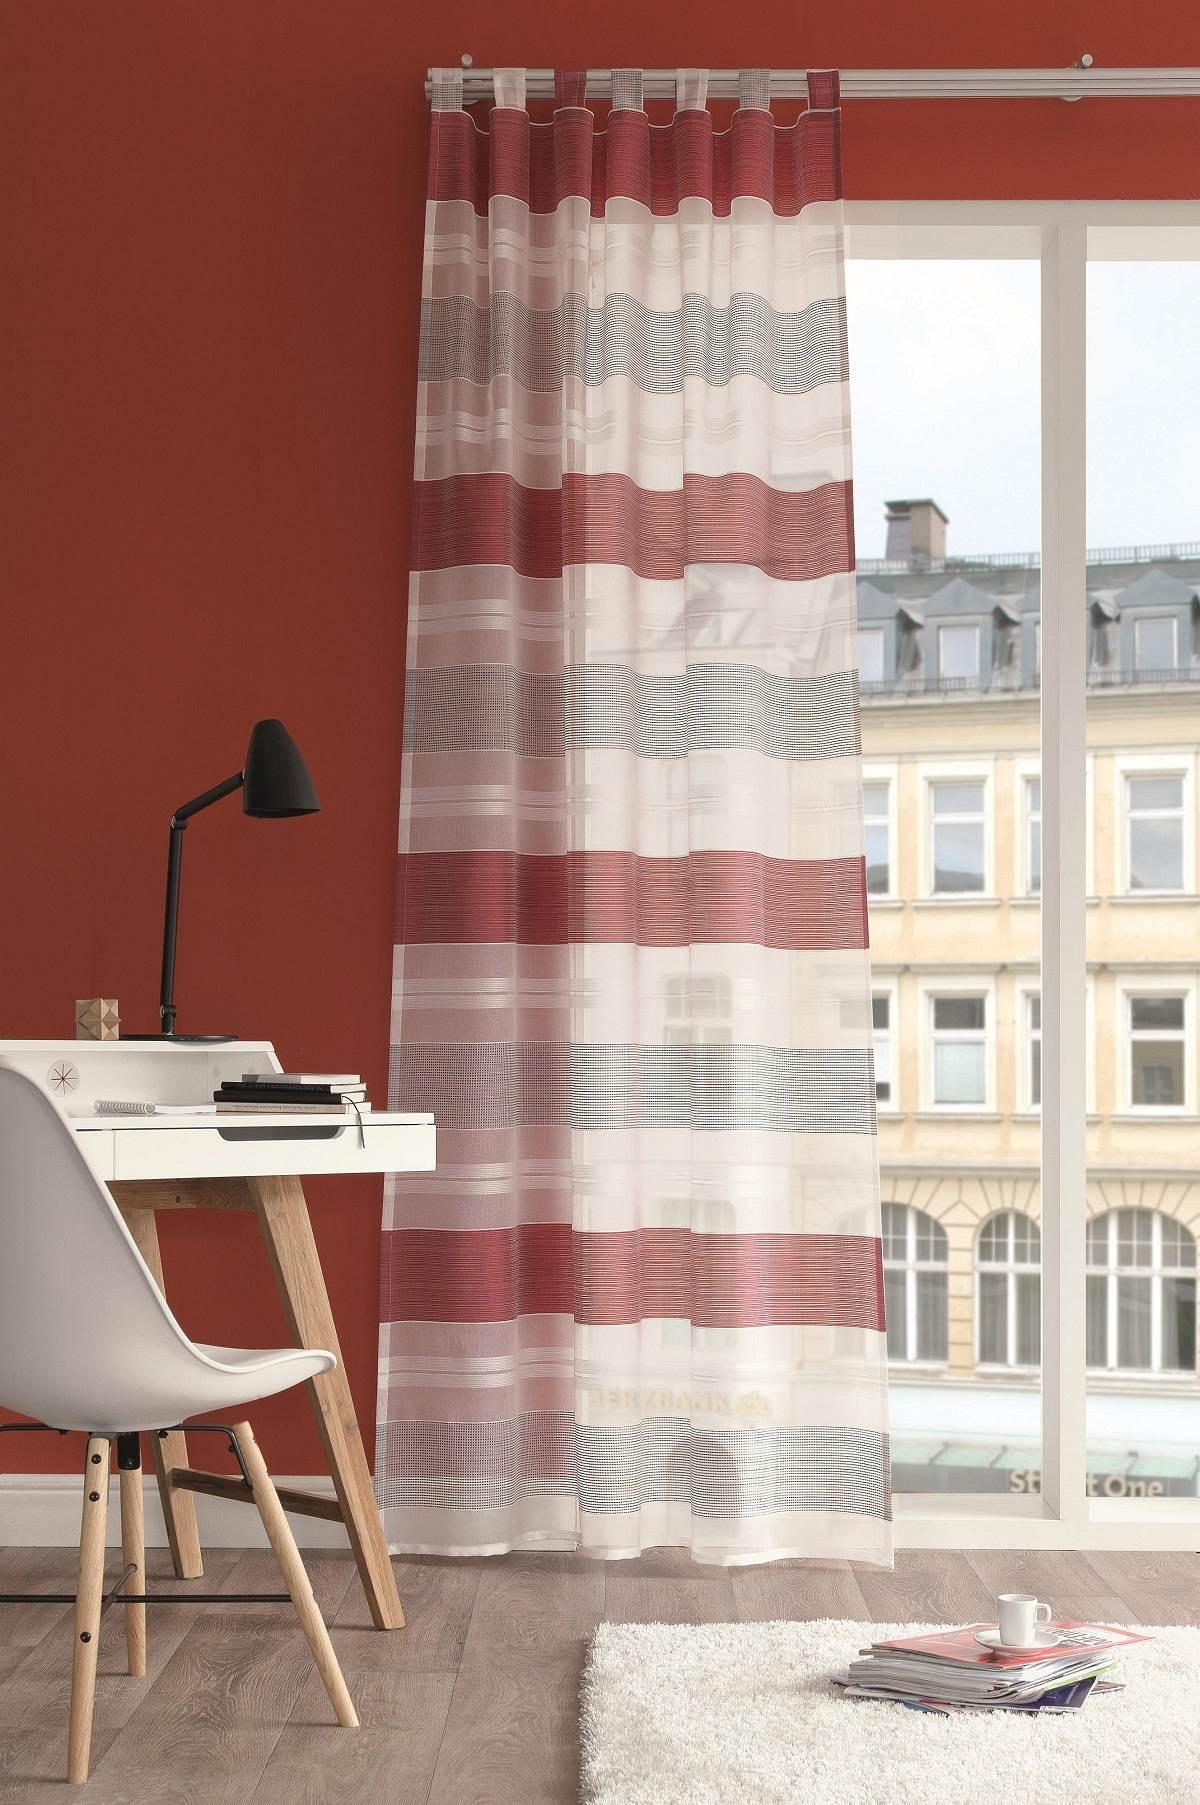 gardinen welt online shop schlaufenschal venedig rot mit querstreifen 140x245cm. Black Bedroom Furniture Sets. Home Design Ideas